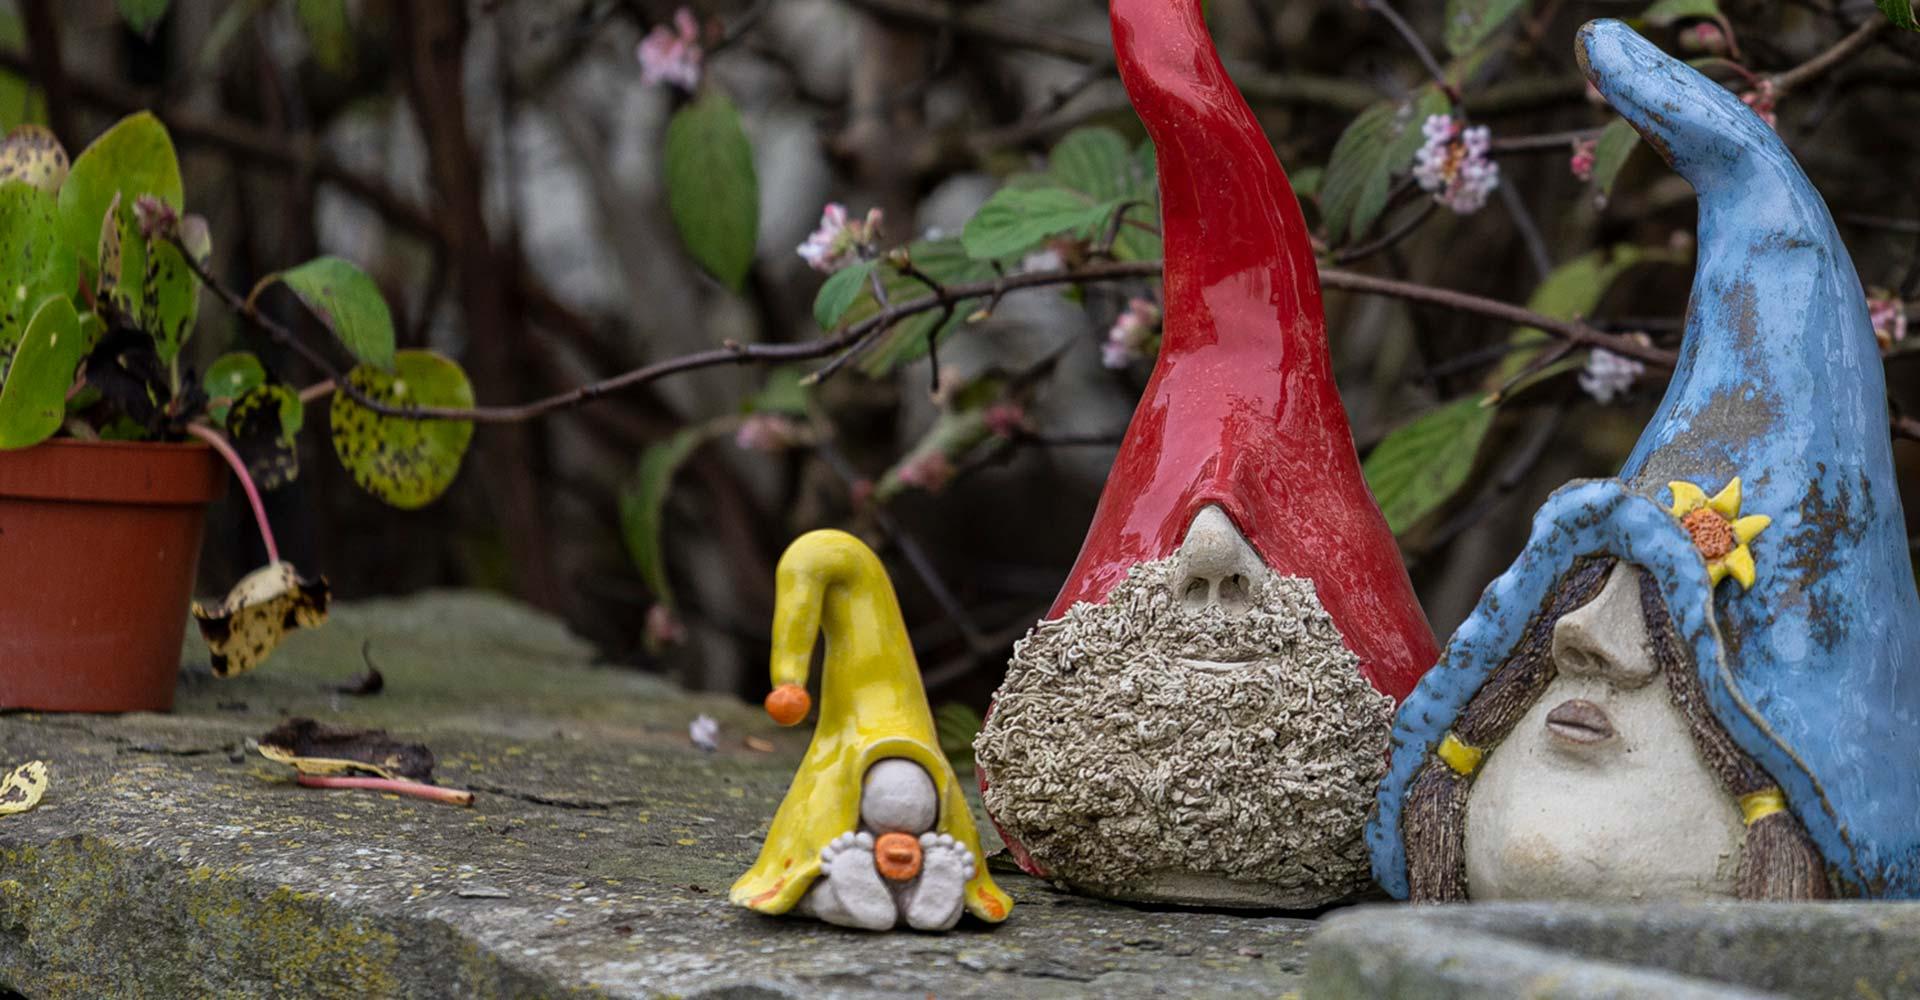 thema workshop in klei atelier: maak je eigen tuinkabouter